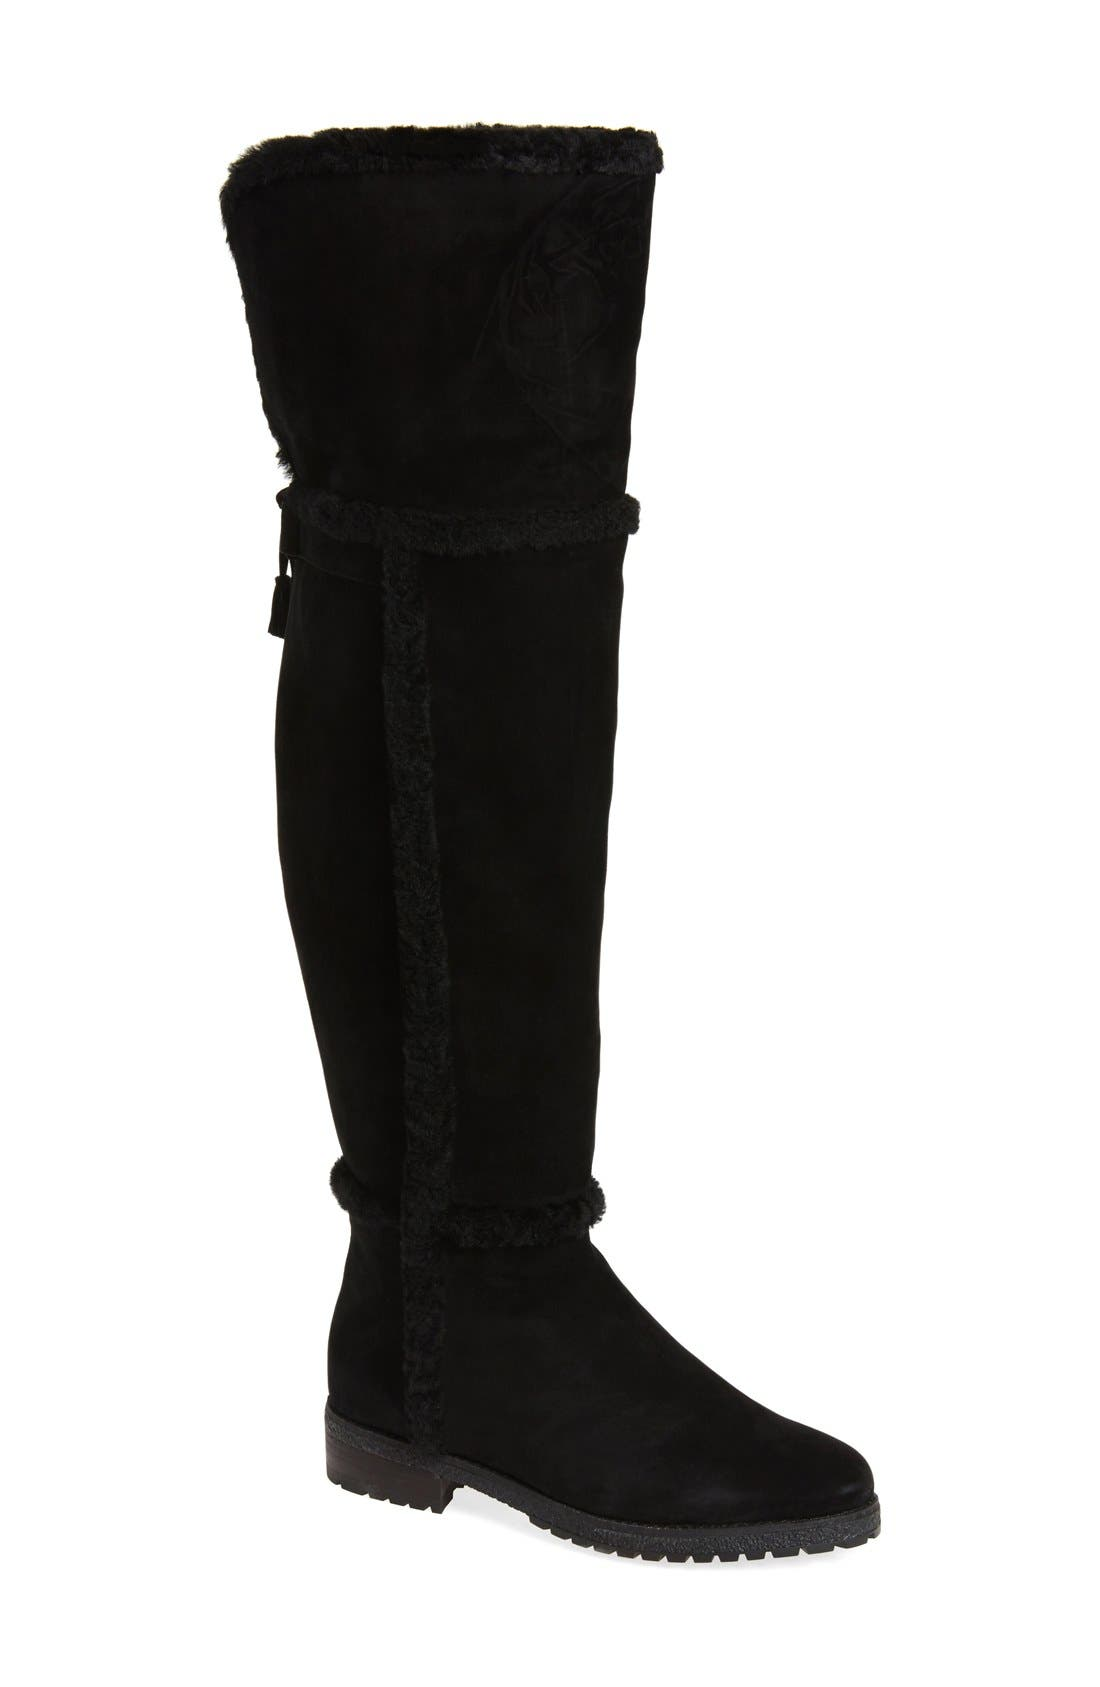 Alternate Image 1 Selected - Frye 'Tamara' Genuine Shearling Over the Knee Boot (Women)